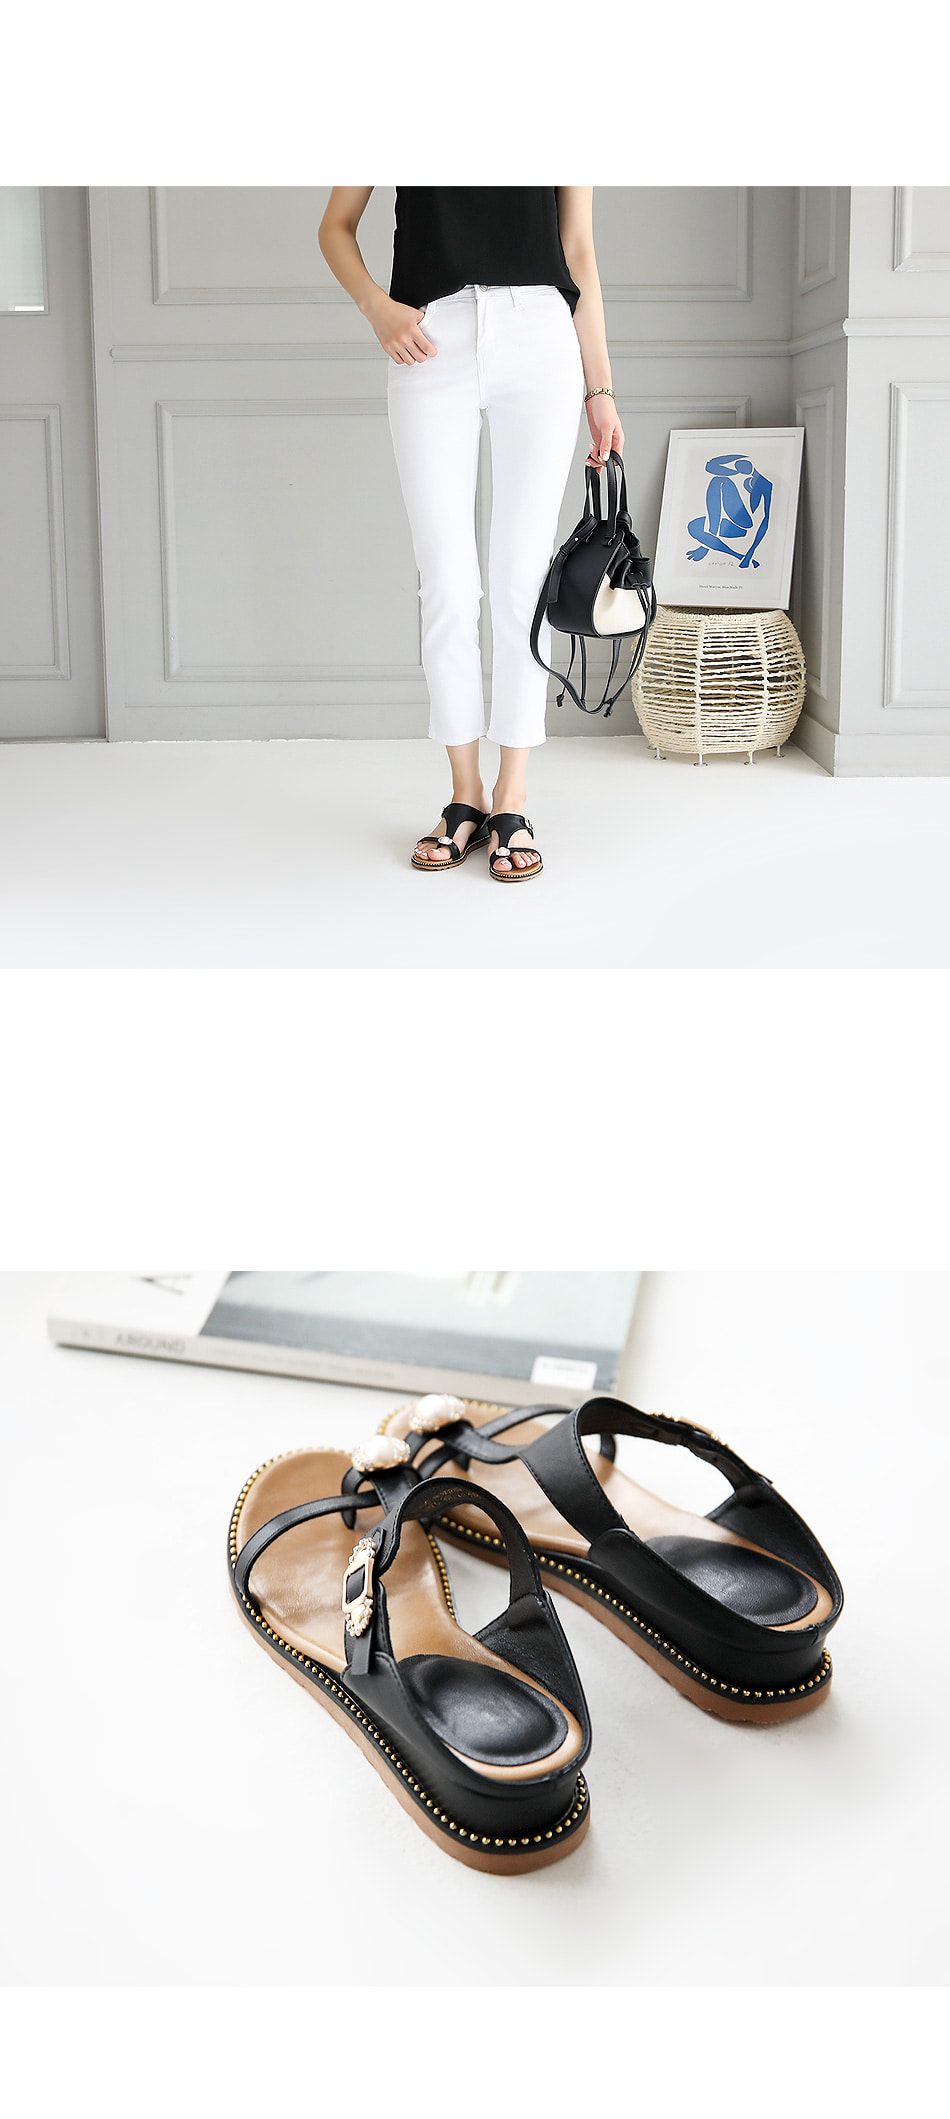 Chepron wedge slippers 4cm